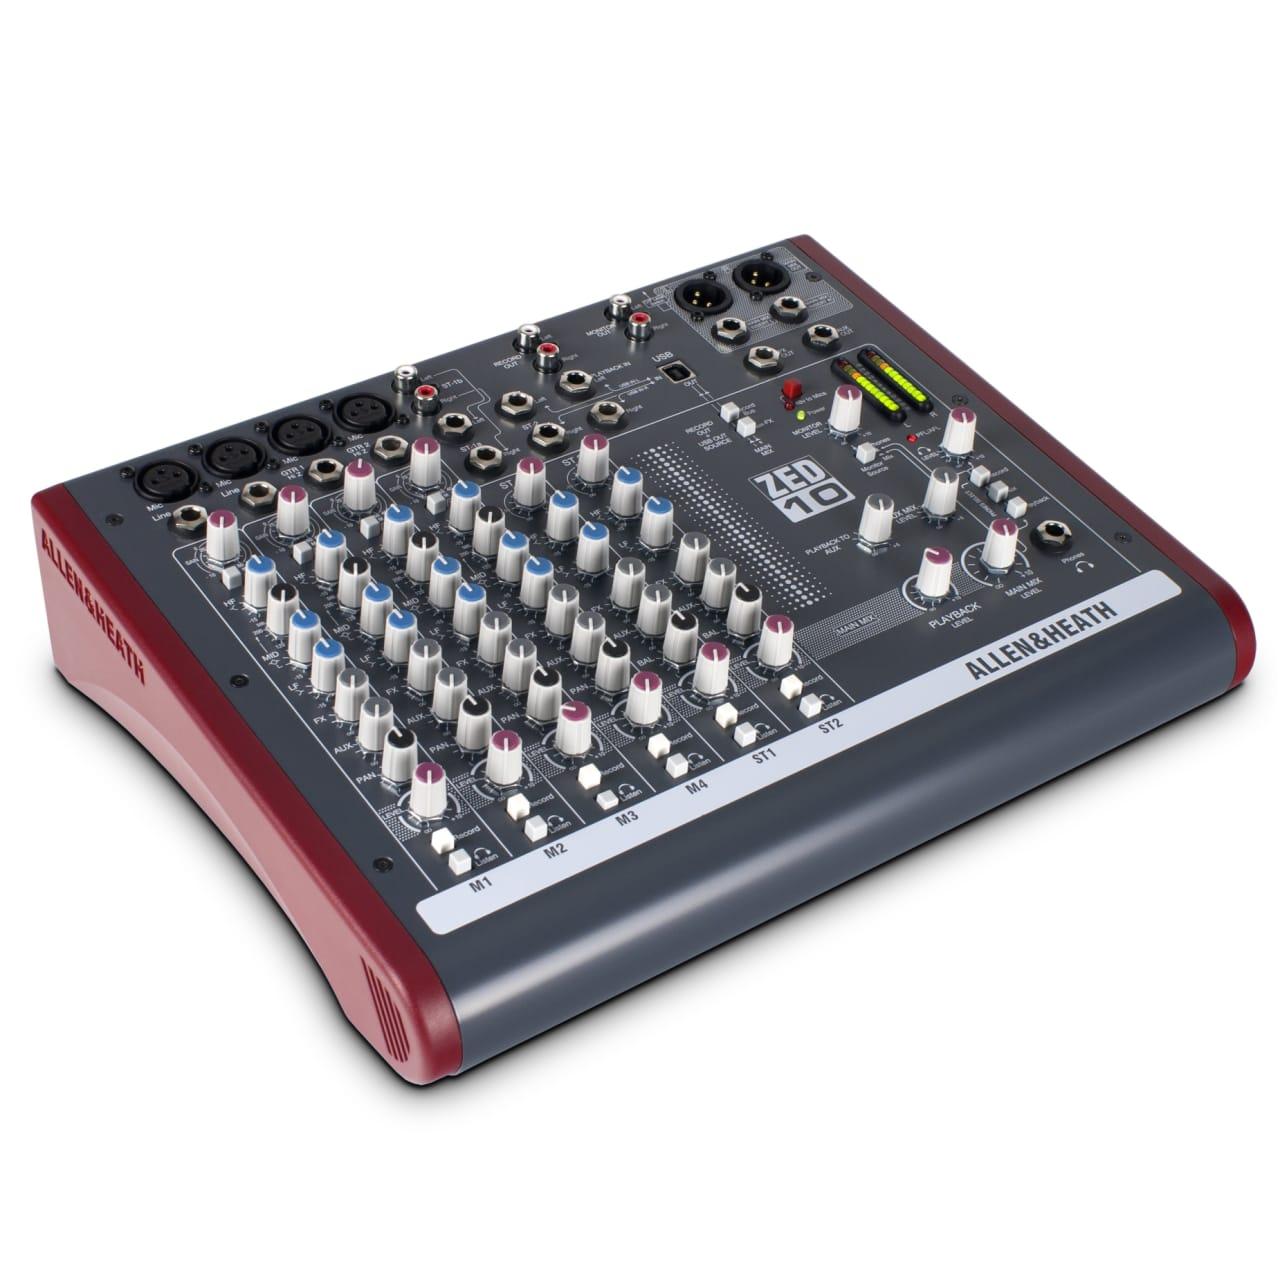 Global Views Lp: Allen & Heath ZED-10 10-channel Mixer, 4 XLR & 3